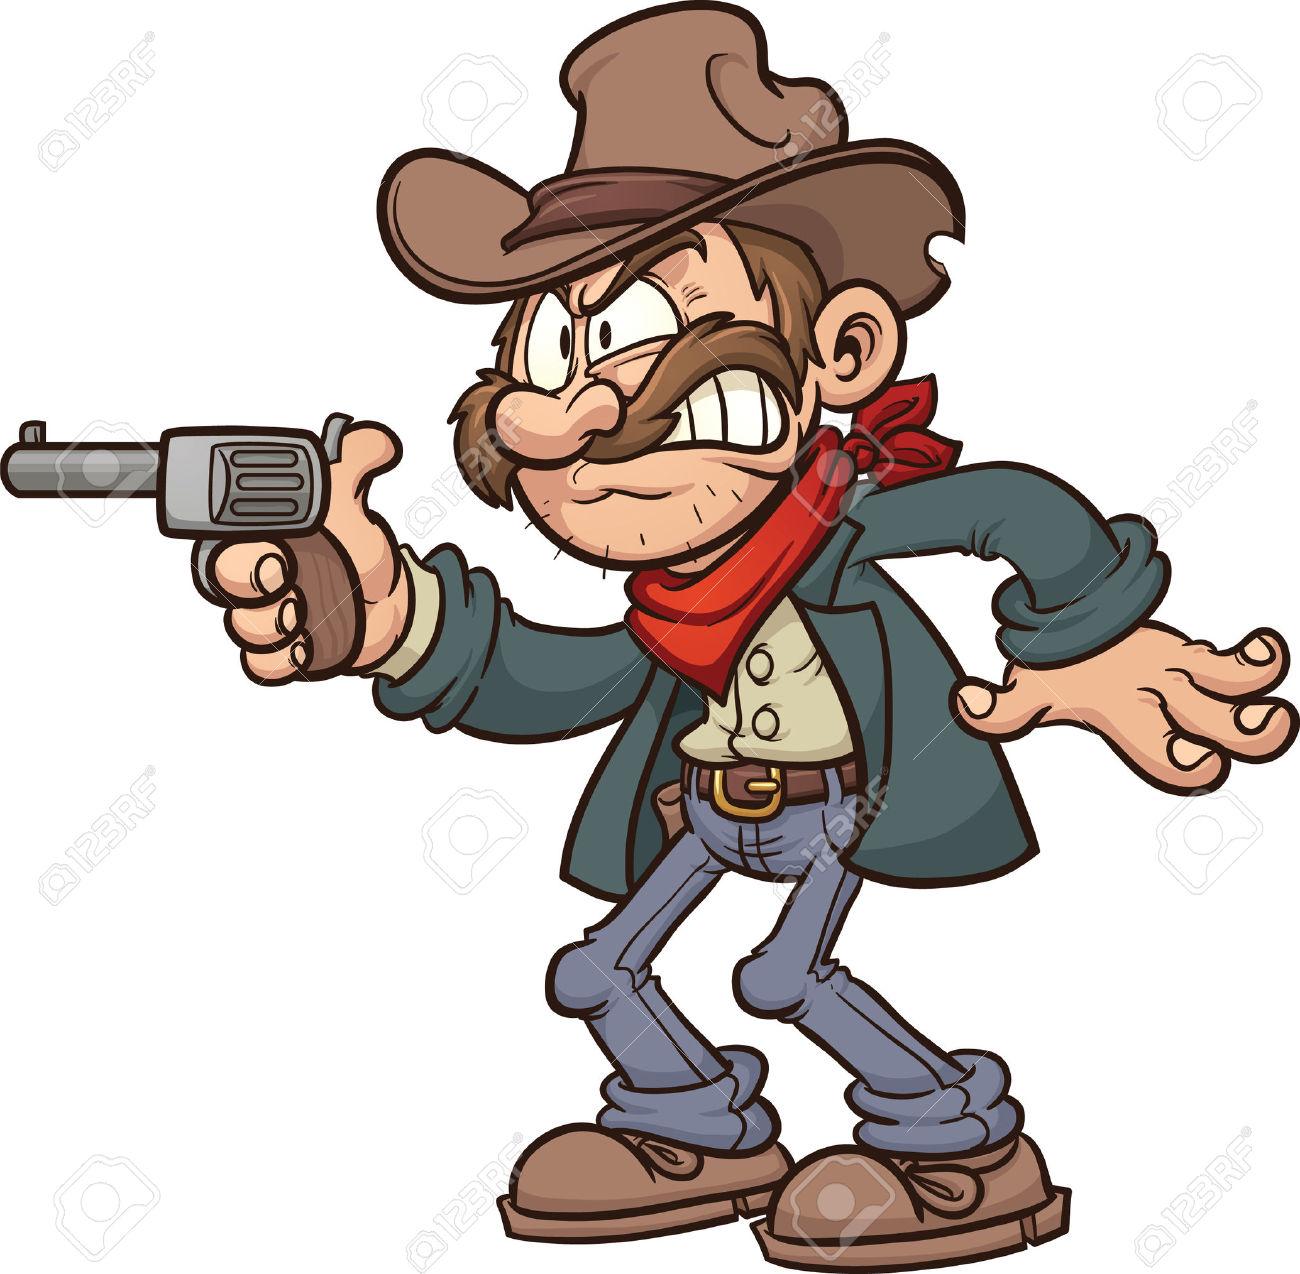 Cow boy and gunslinger clipart.